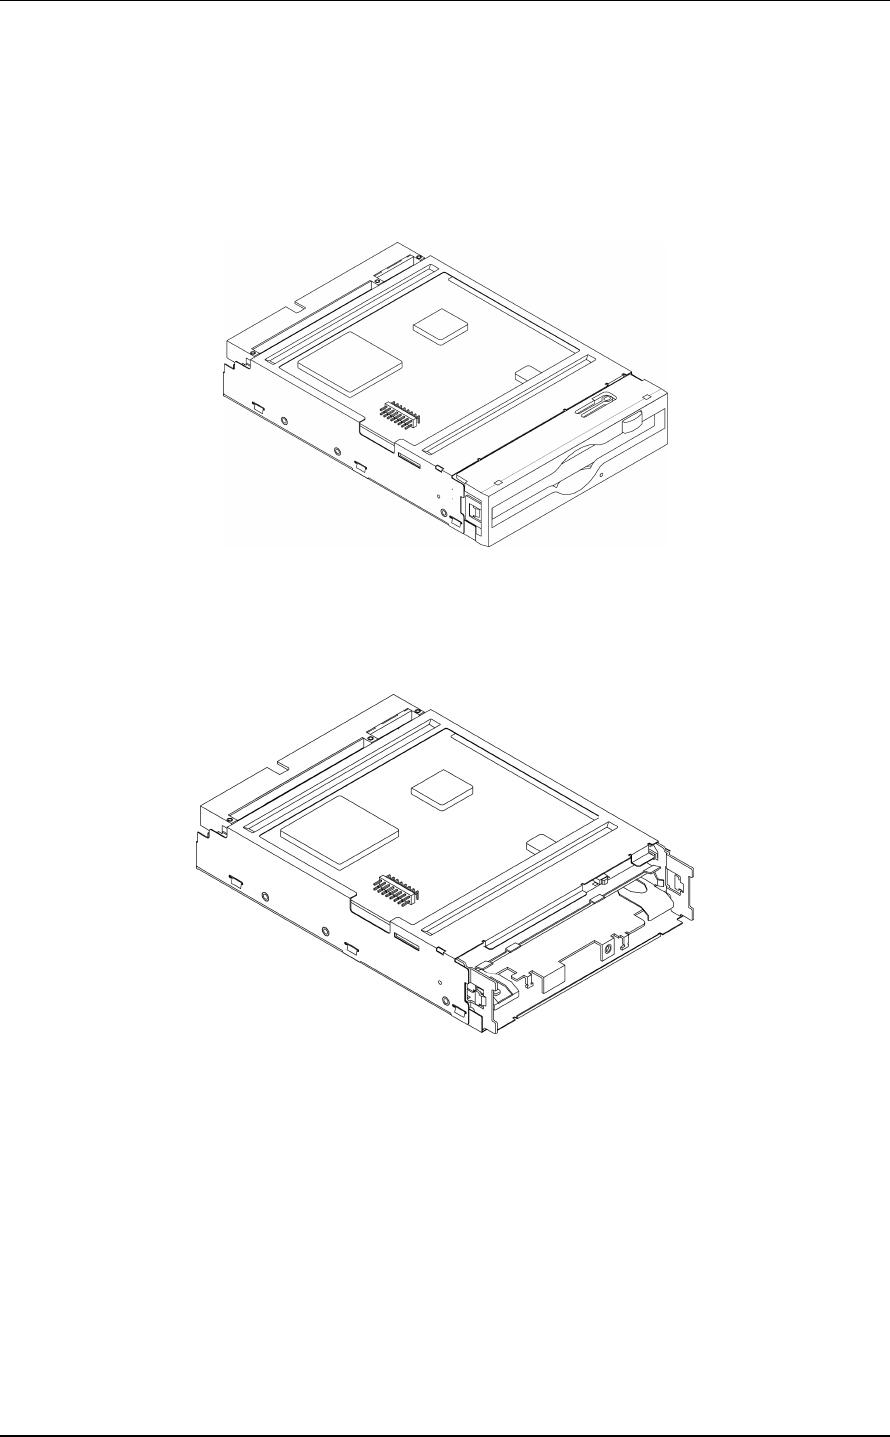 Fujitsu Mcm3064Ss Users Manual MCM3064SS, MCM3130SS